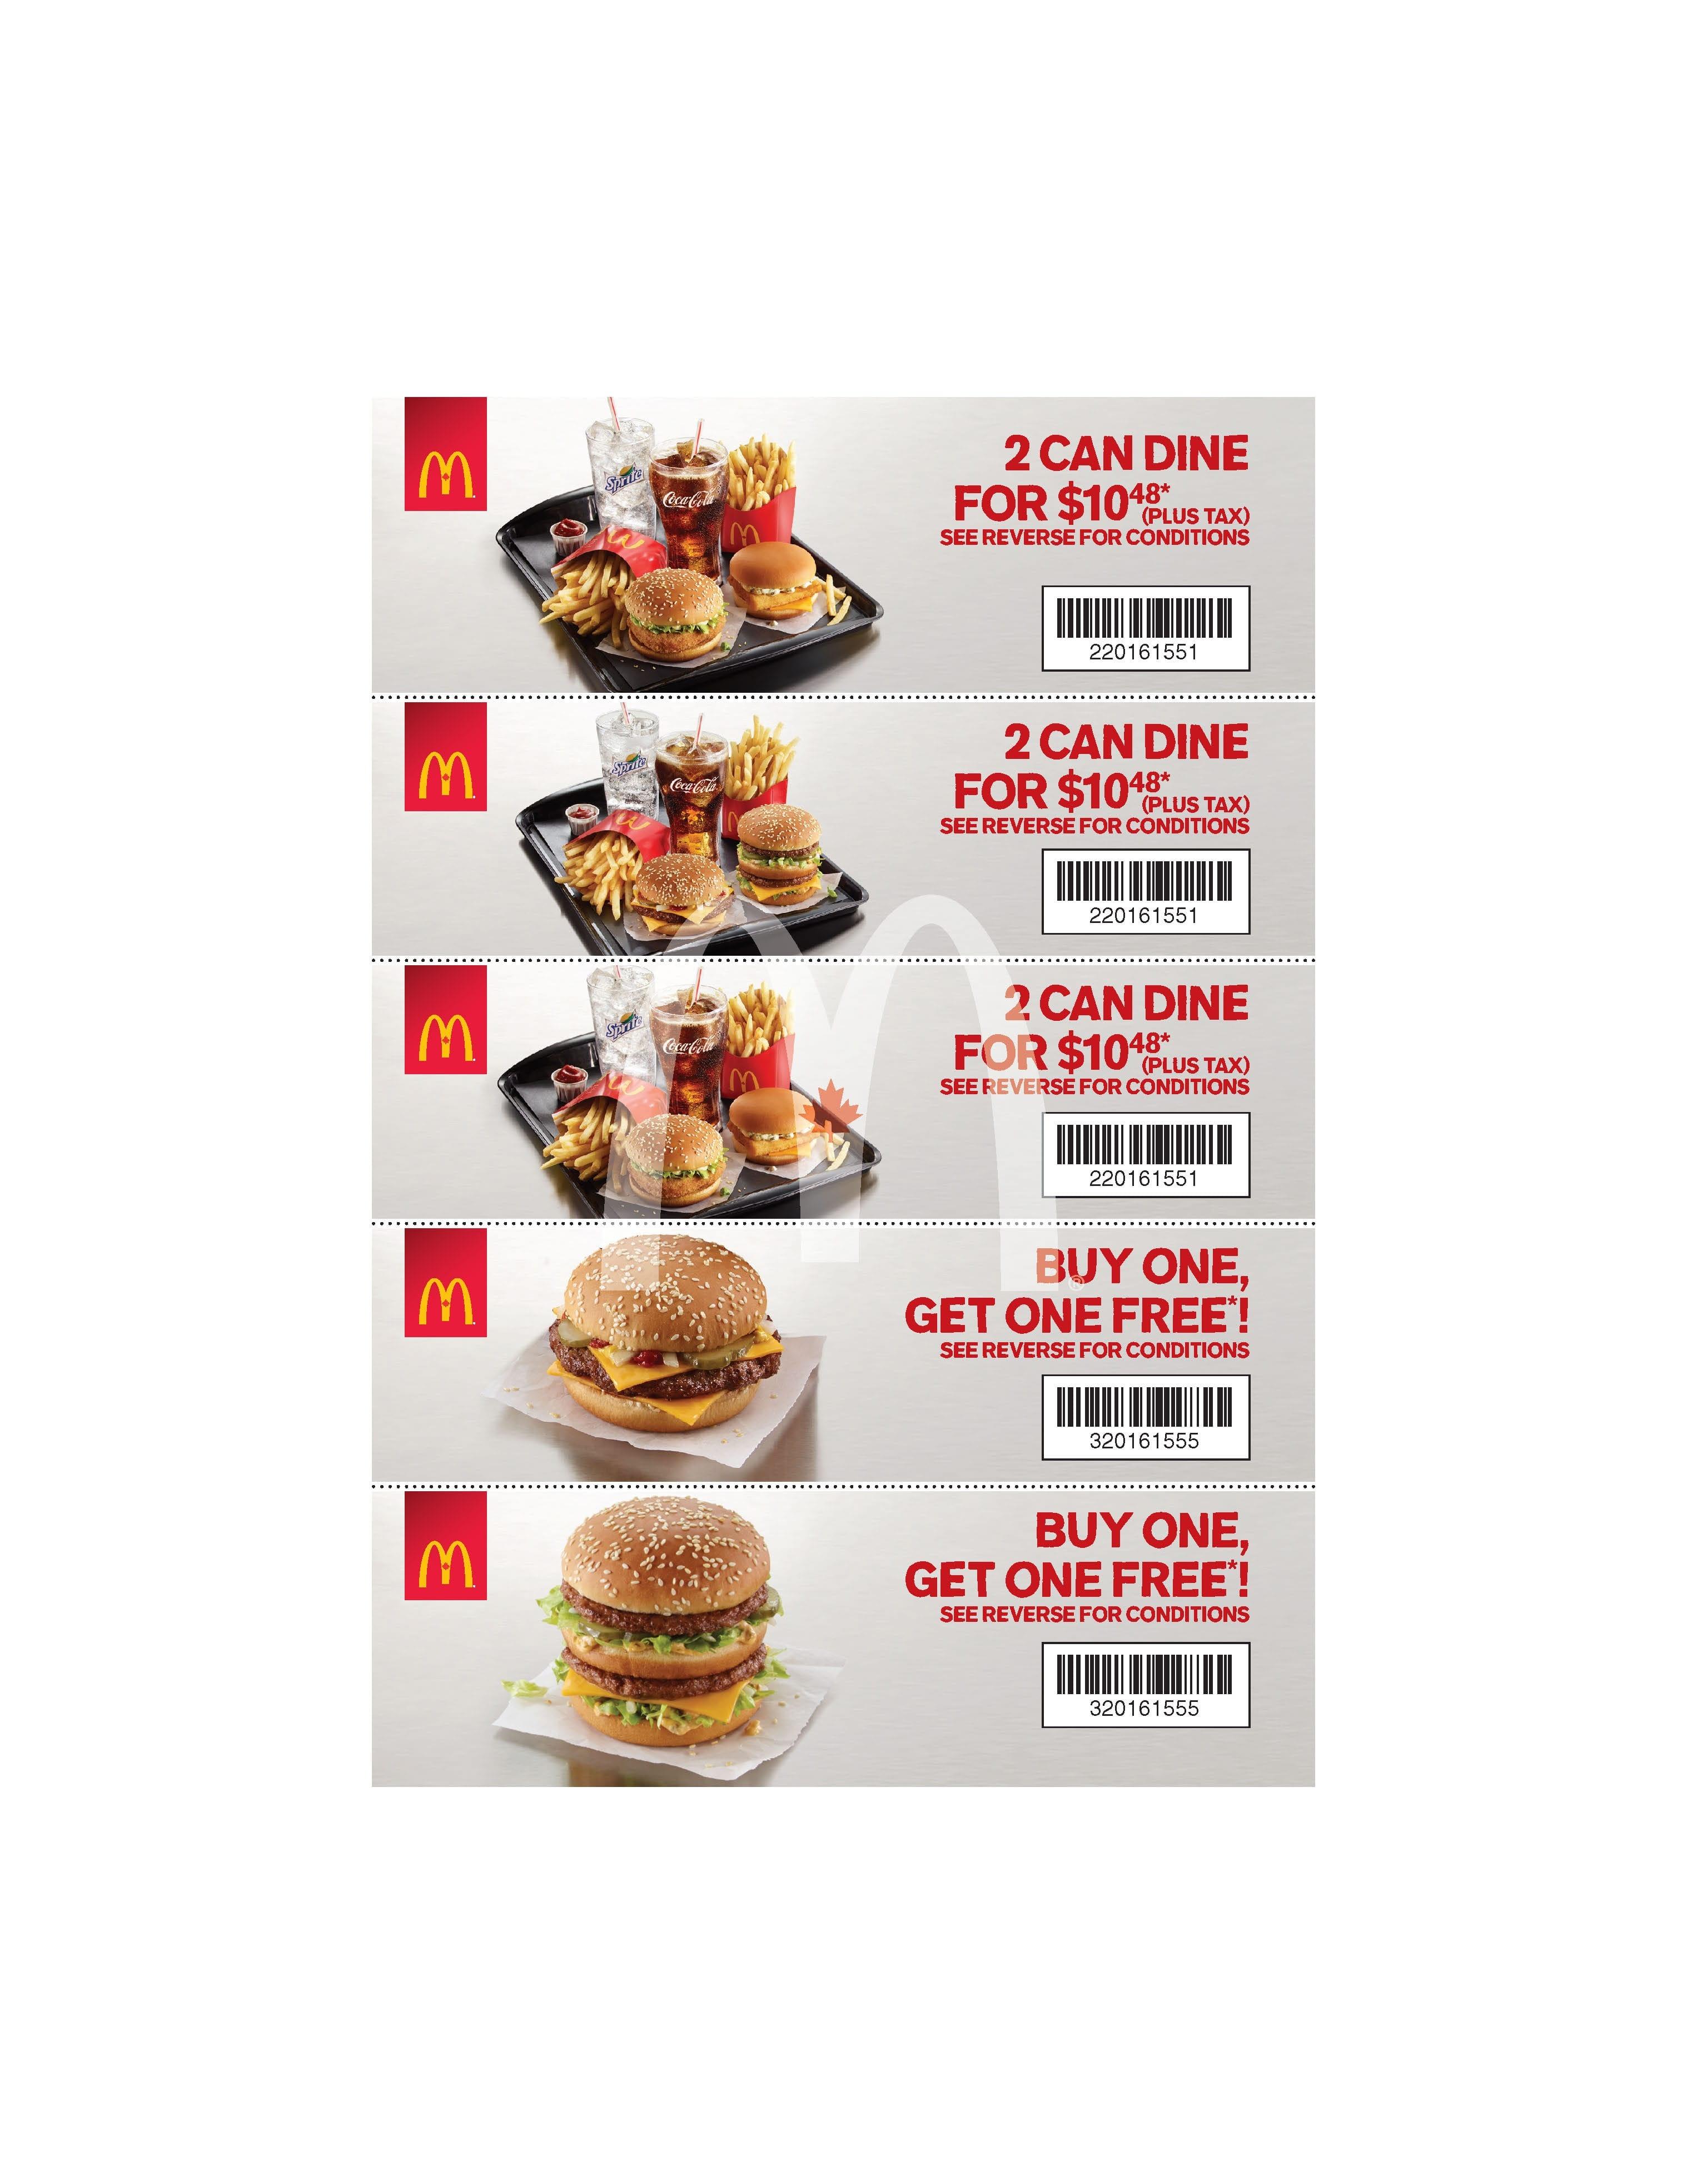 Sheet-Mcdonalds-Coupons-Free-Printable – Printable Coupons Online - Free Printable Mcdonalds Coupons Online